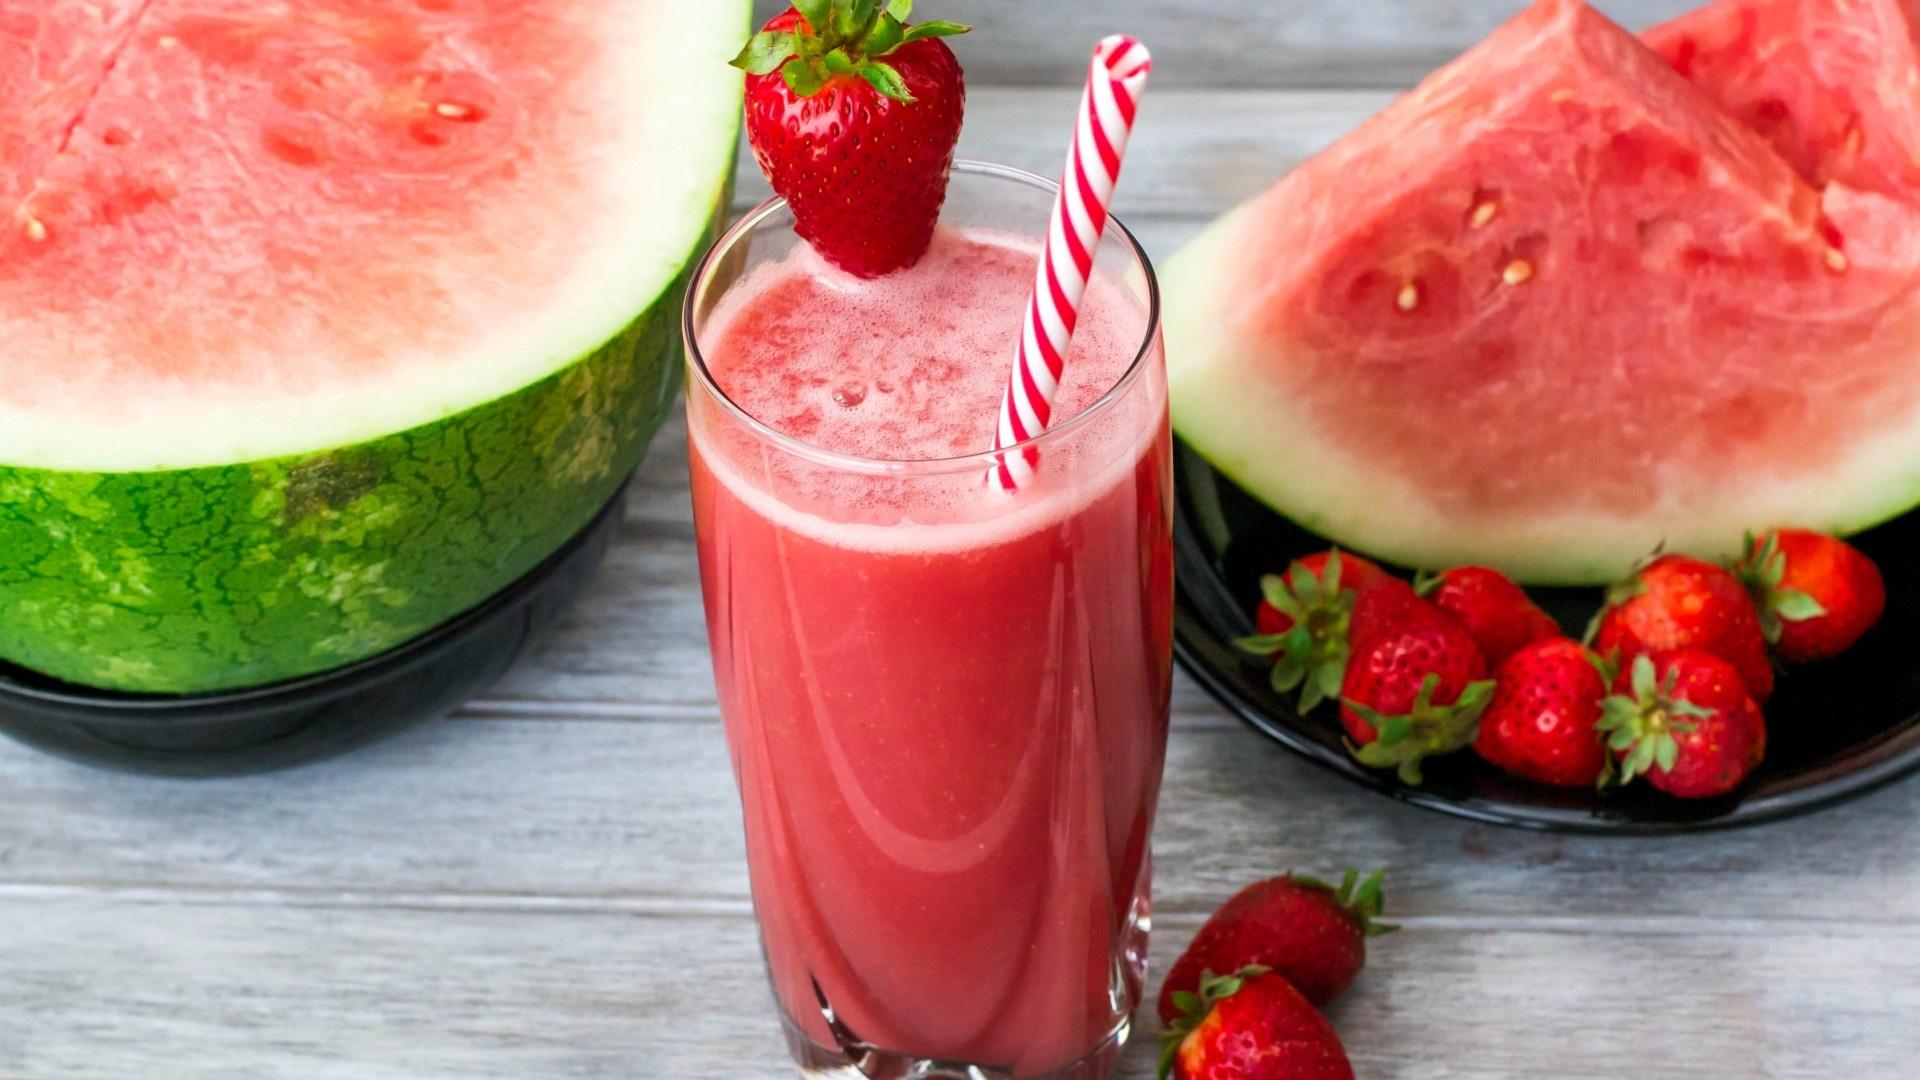 Watermelon High Quality